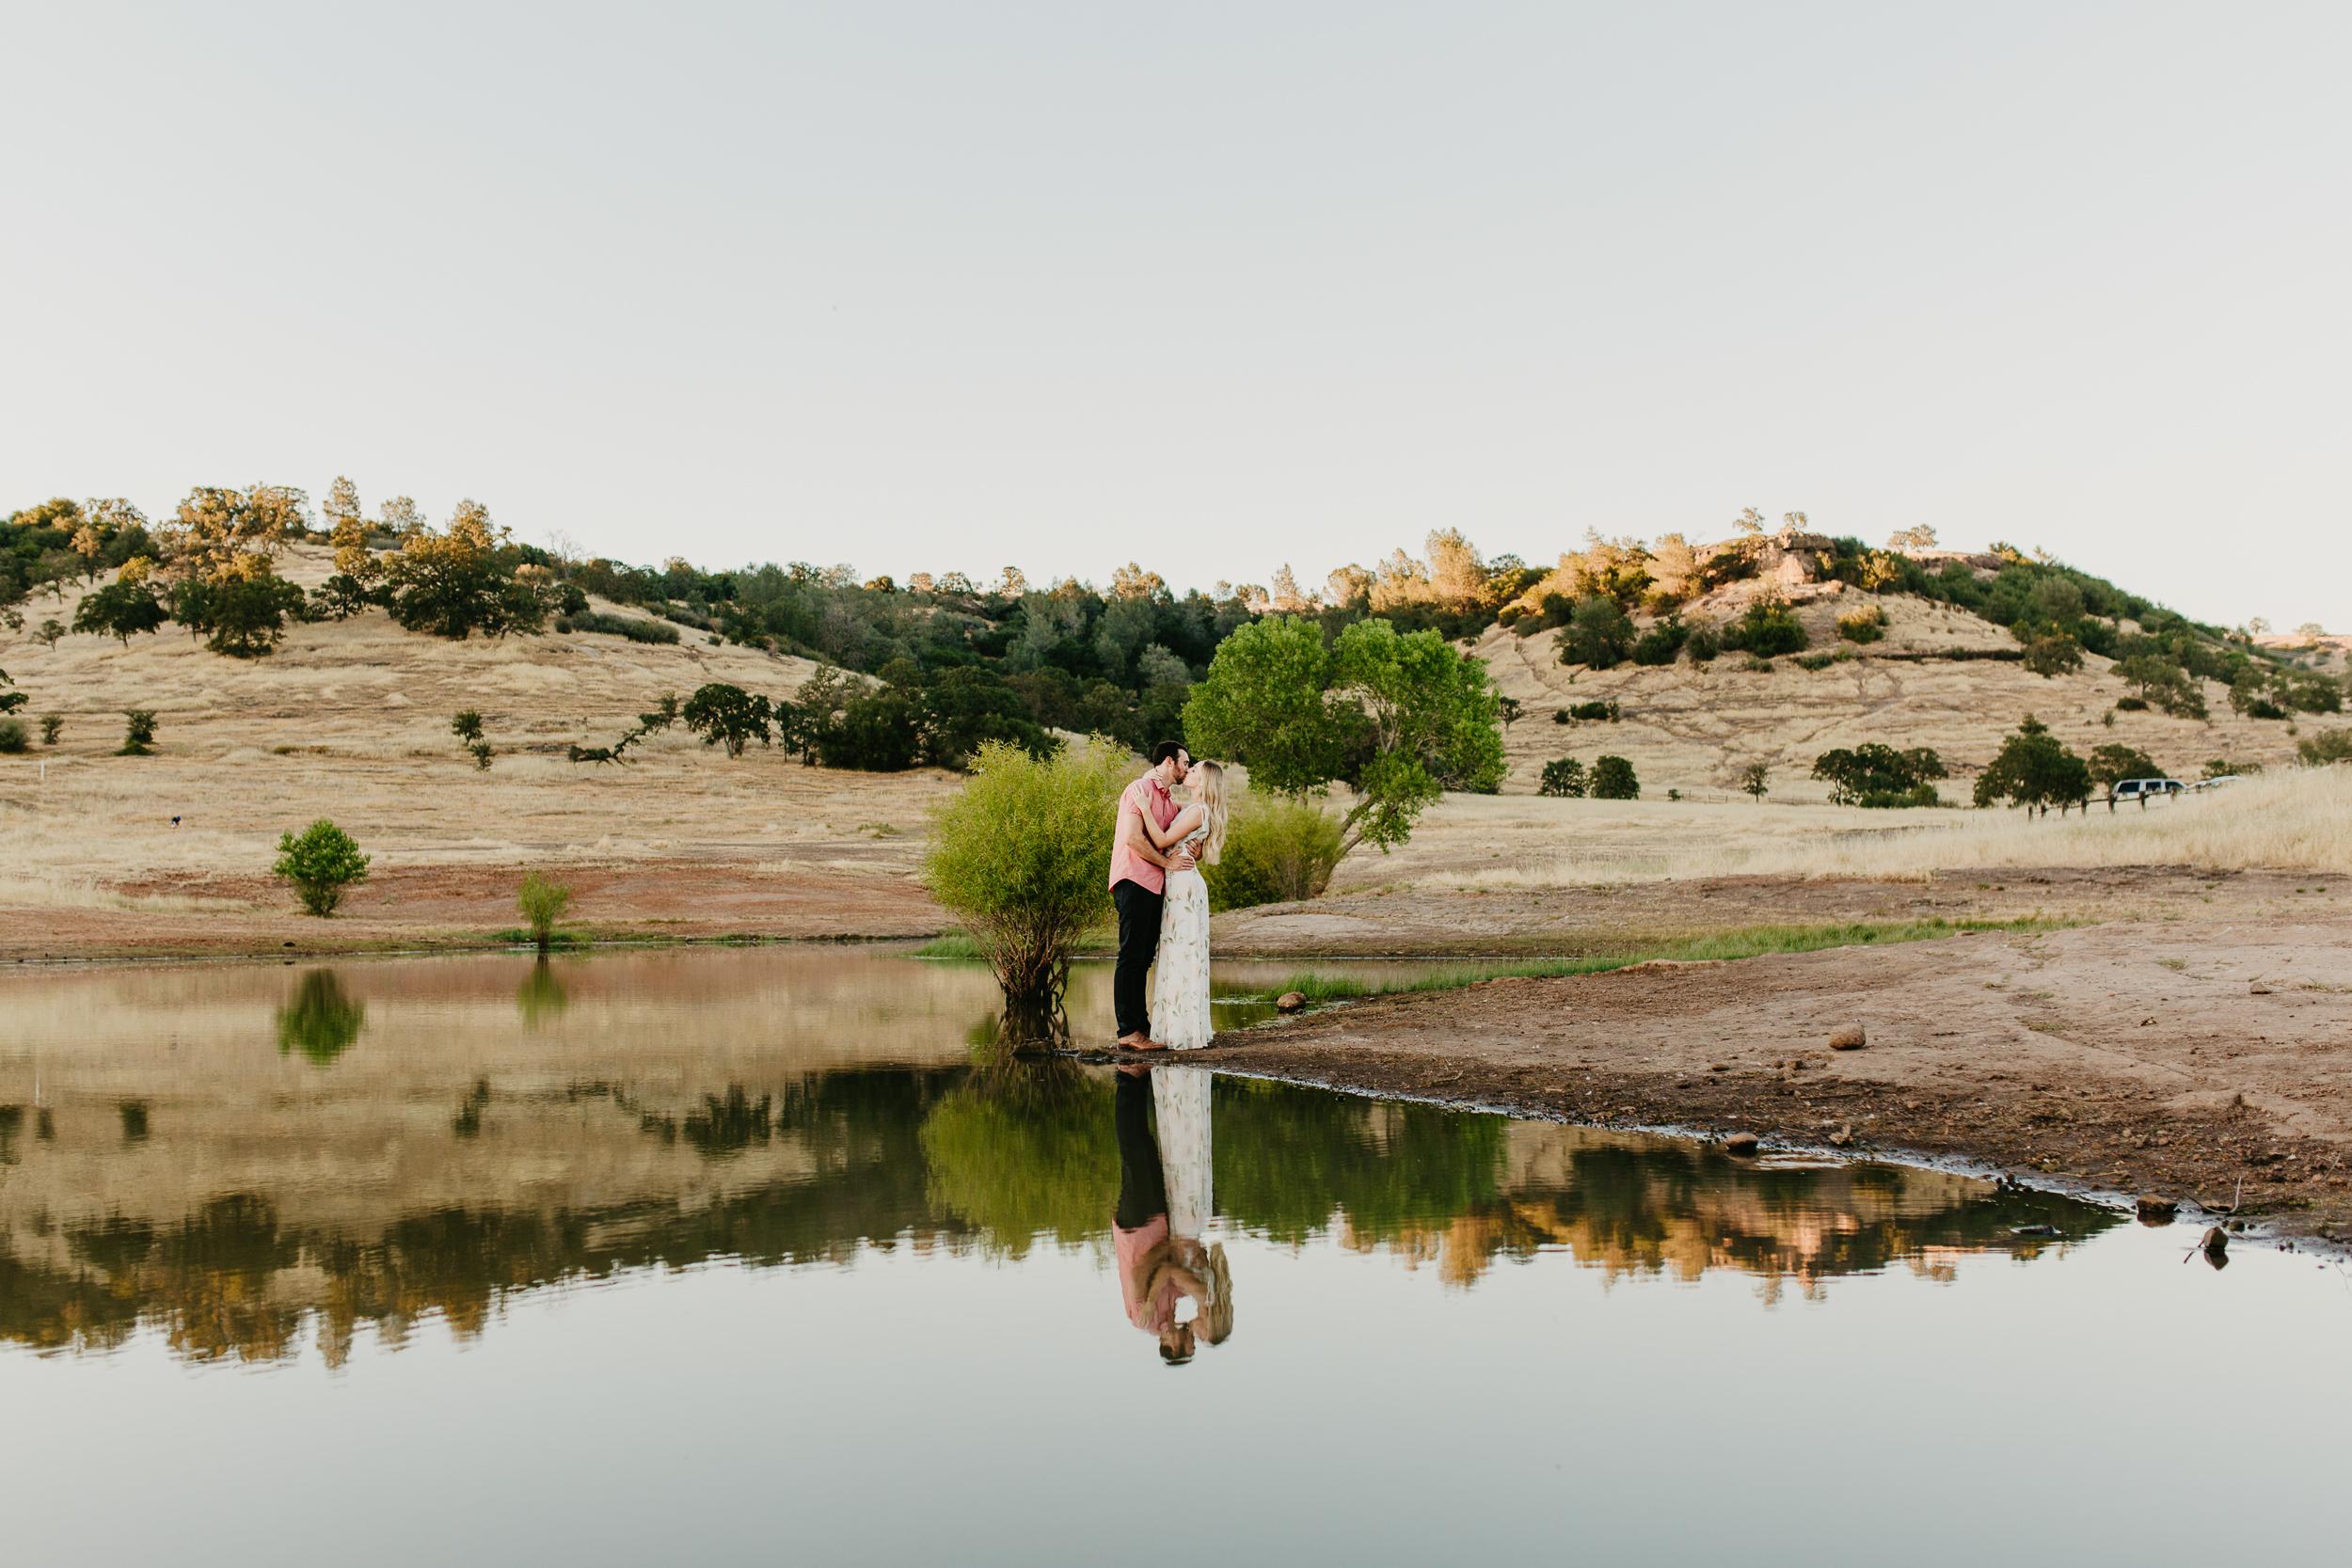 Engagement Photos-Ranalla Photo and Films-90.jpg